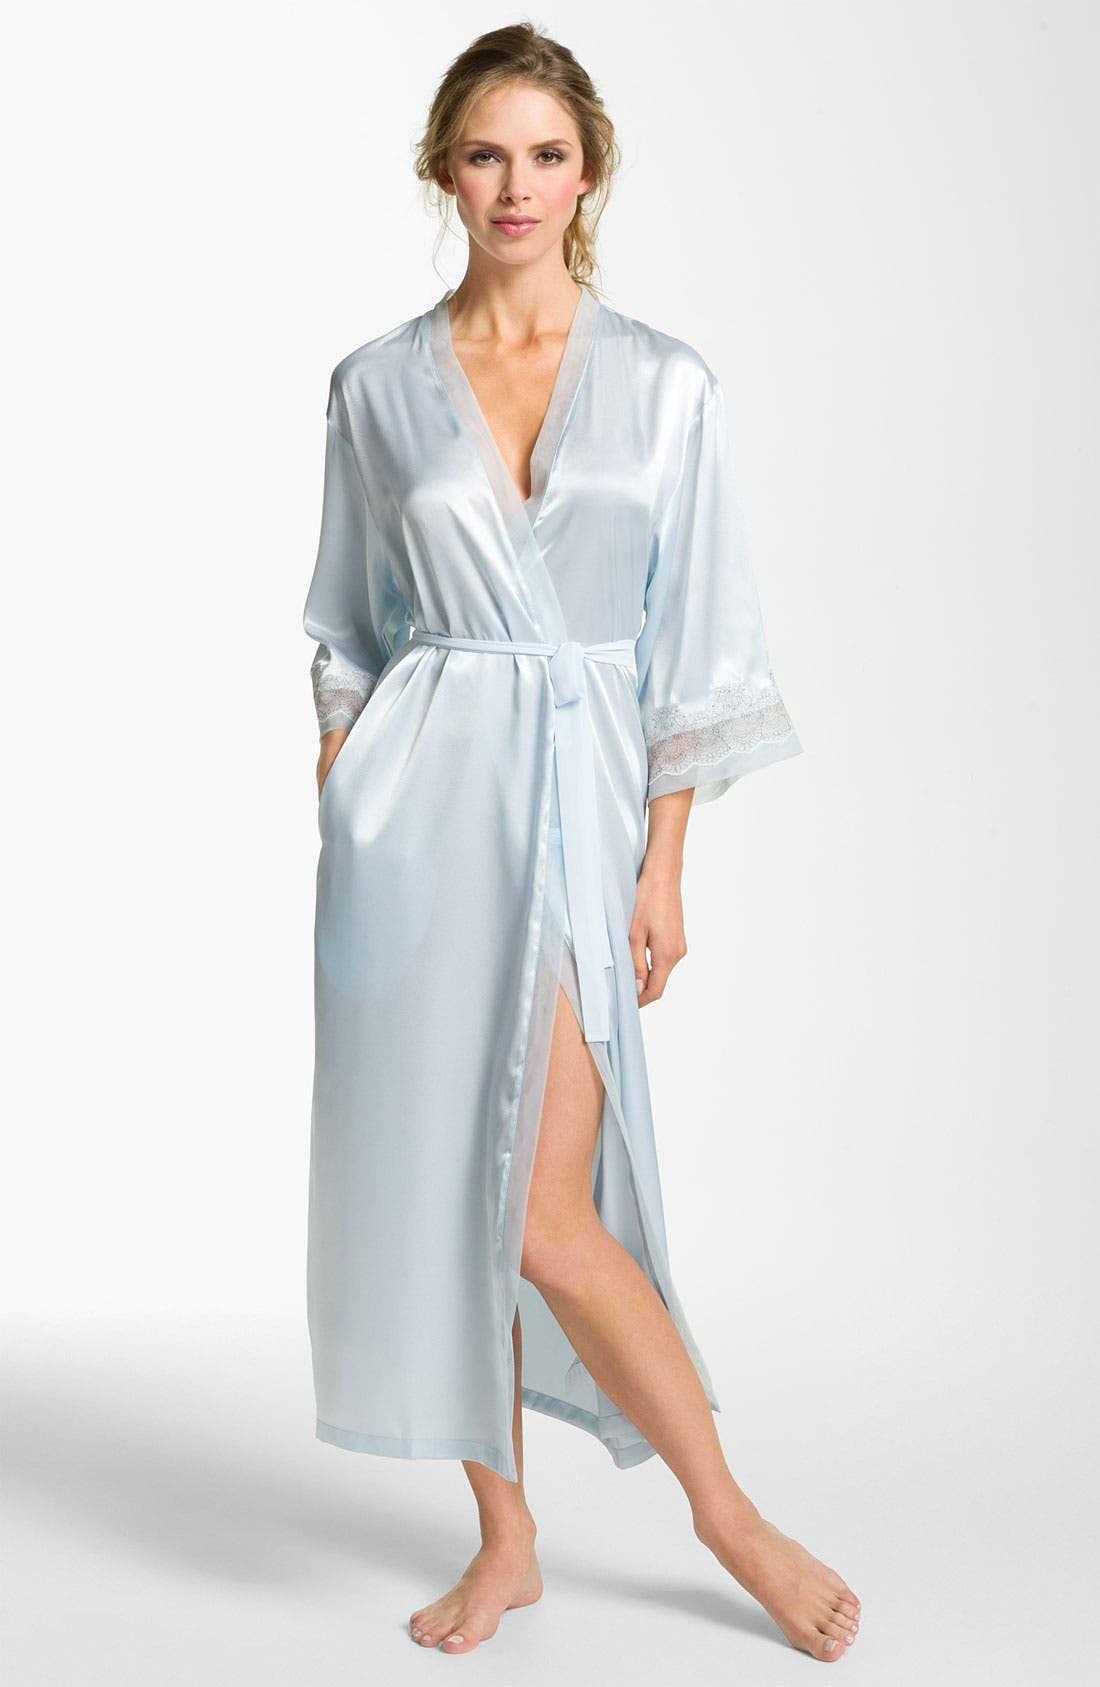 Main Image - Oscar de la Renta Sleepwear 'Elegant' Satin Robe